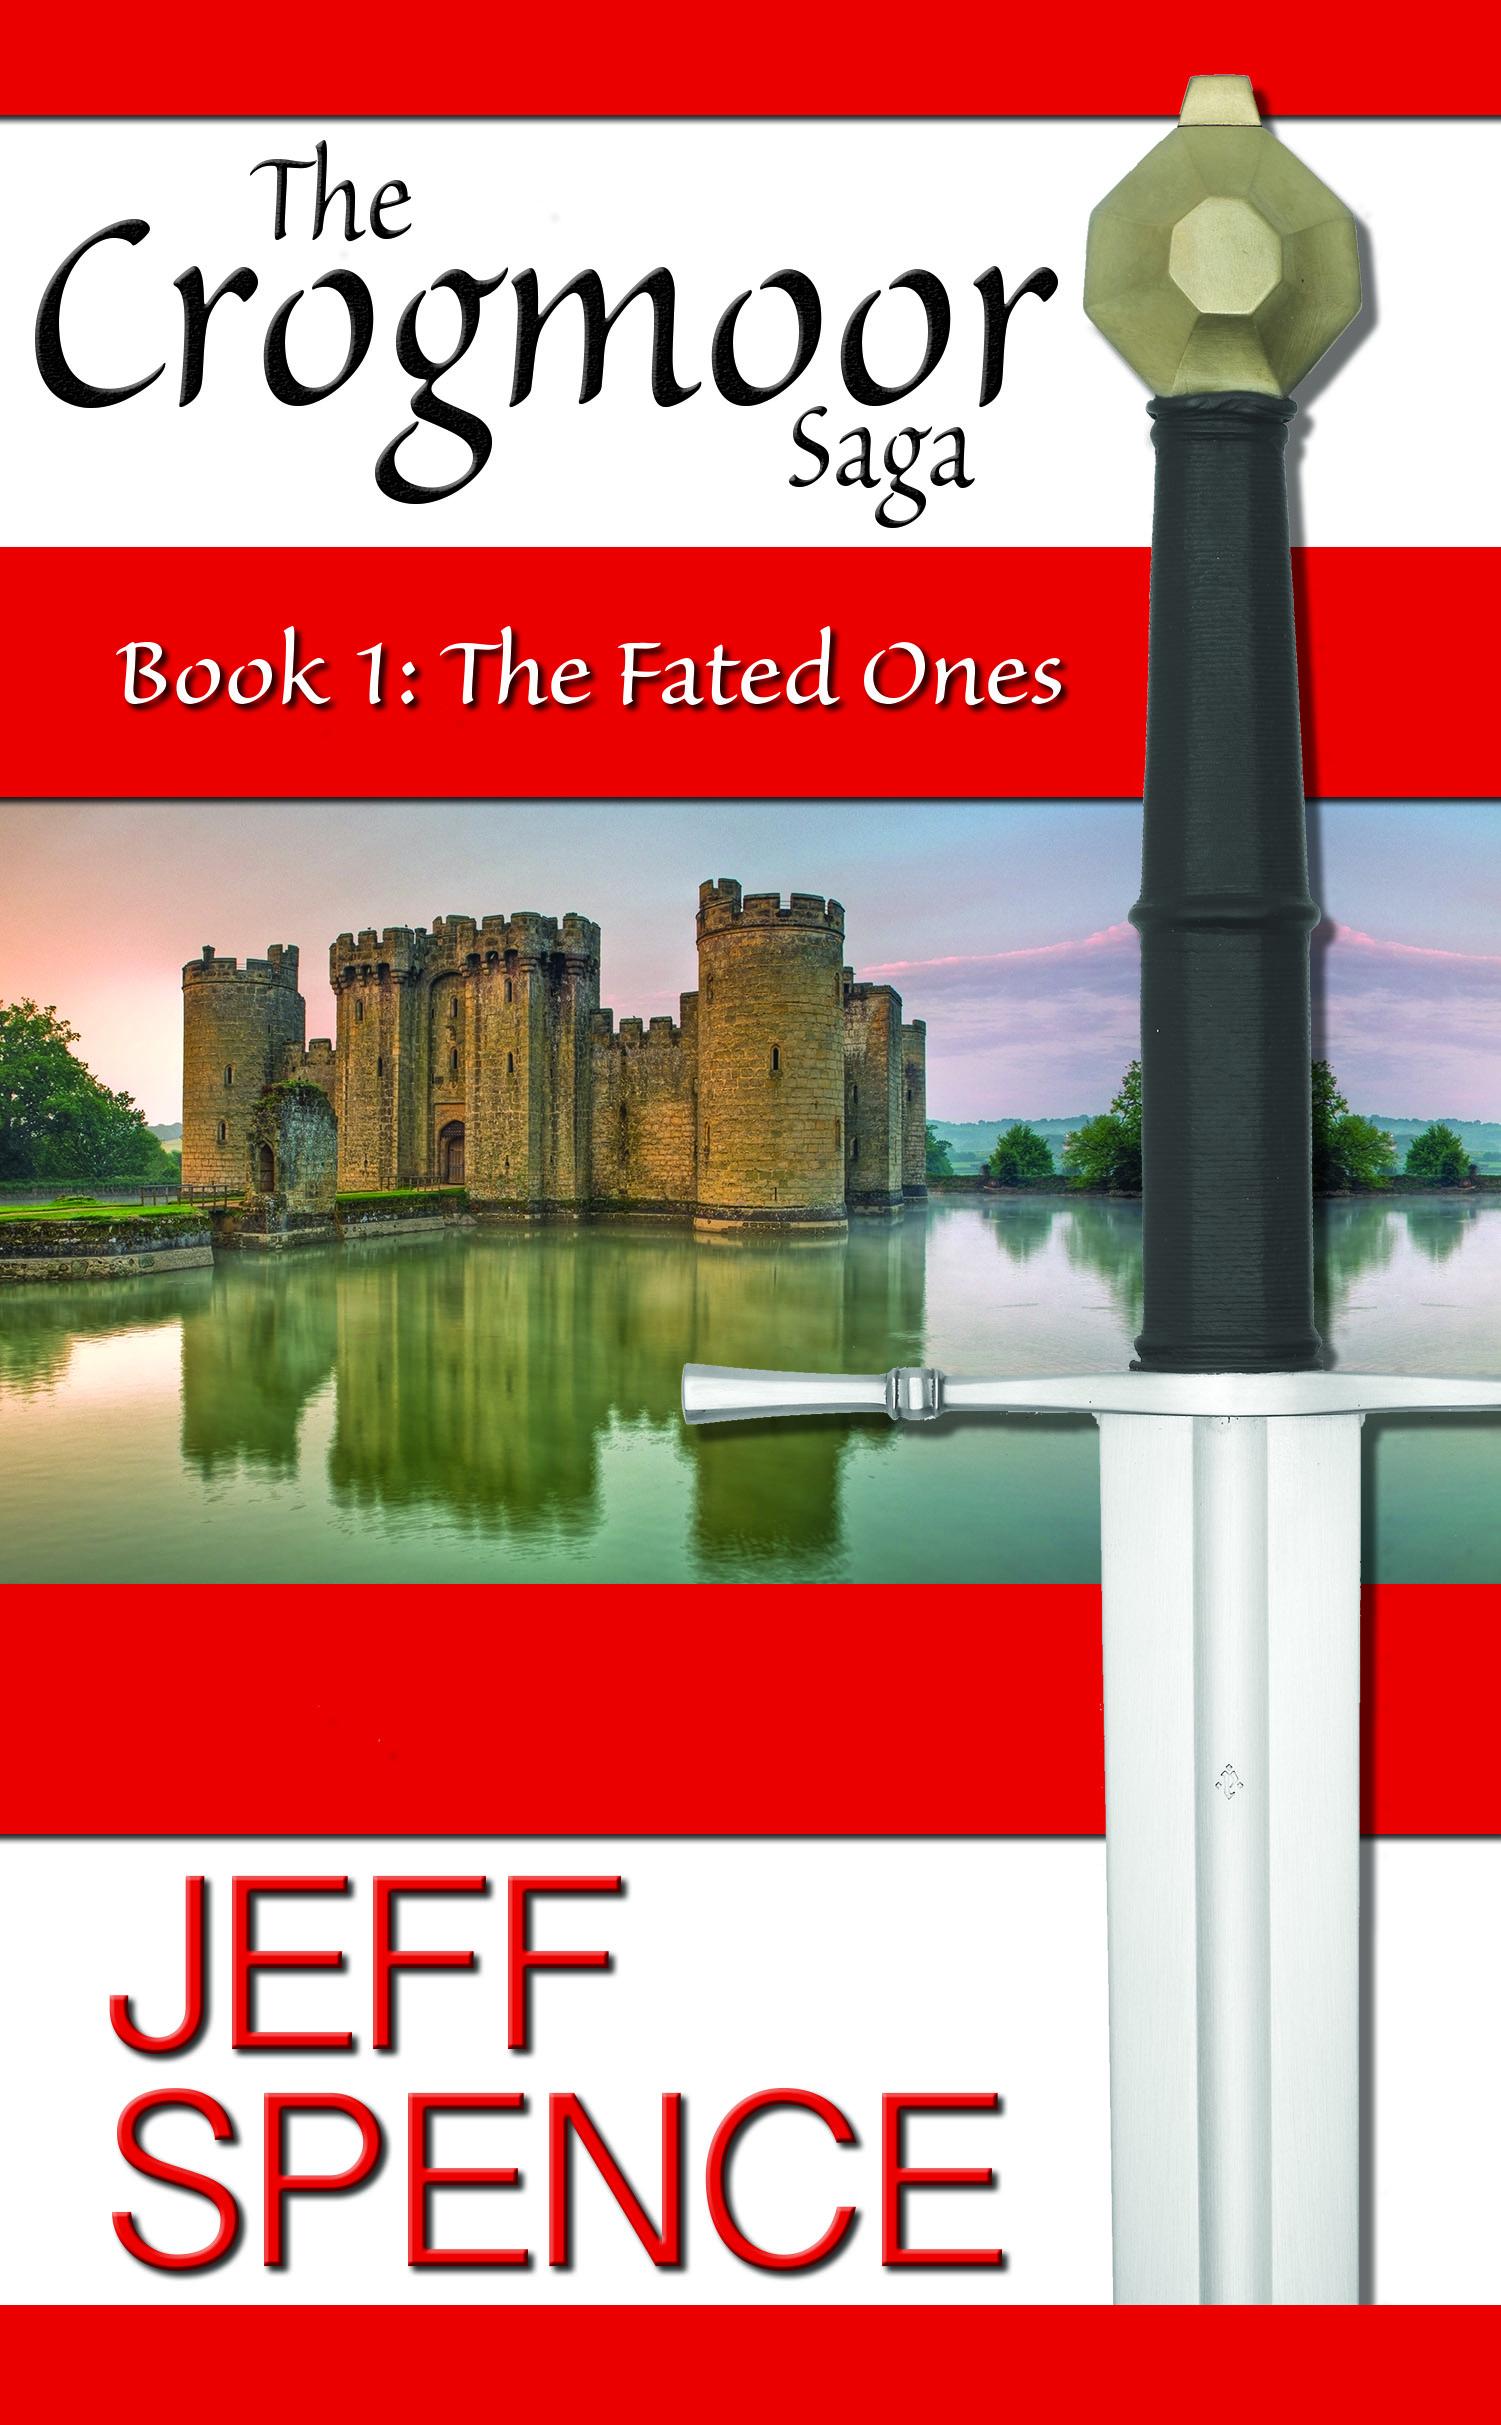 Crogmoor Book 01_The Fated Ones copy.jpg